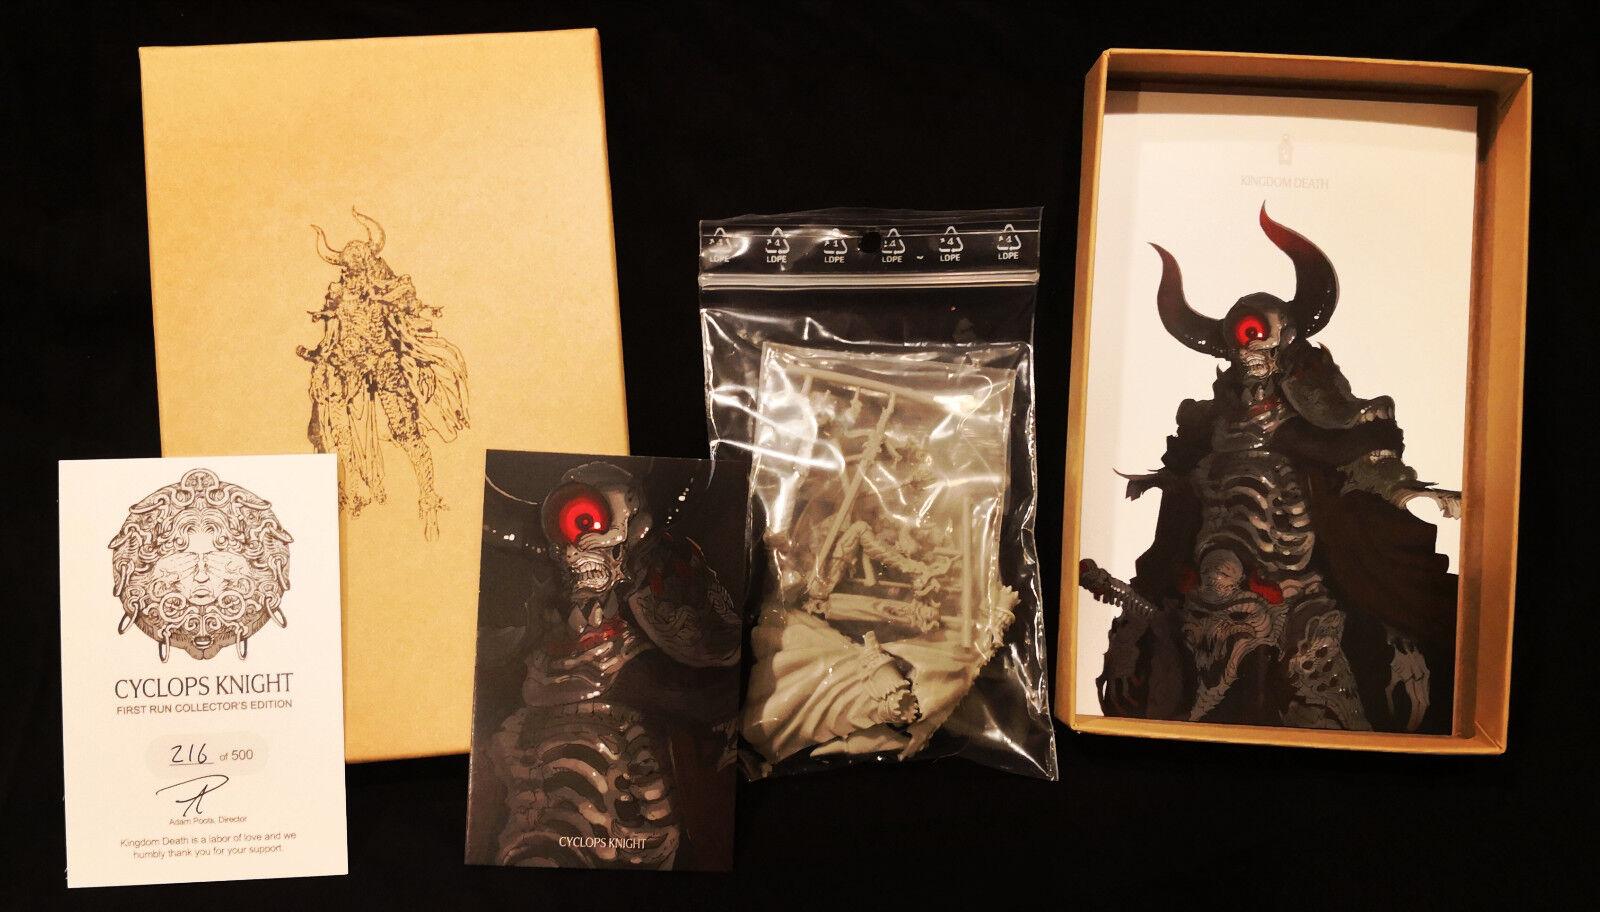 Nouveau Royaume de mort  Cyclope KNIGHT  - first run Edition Collector-dans la main